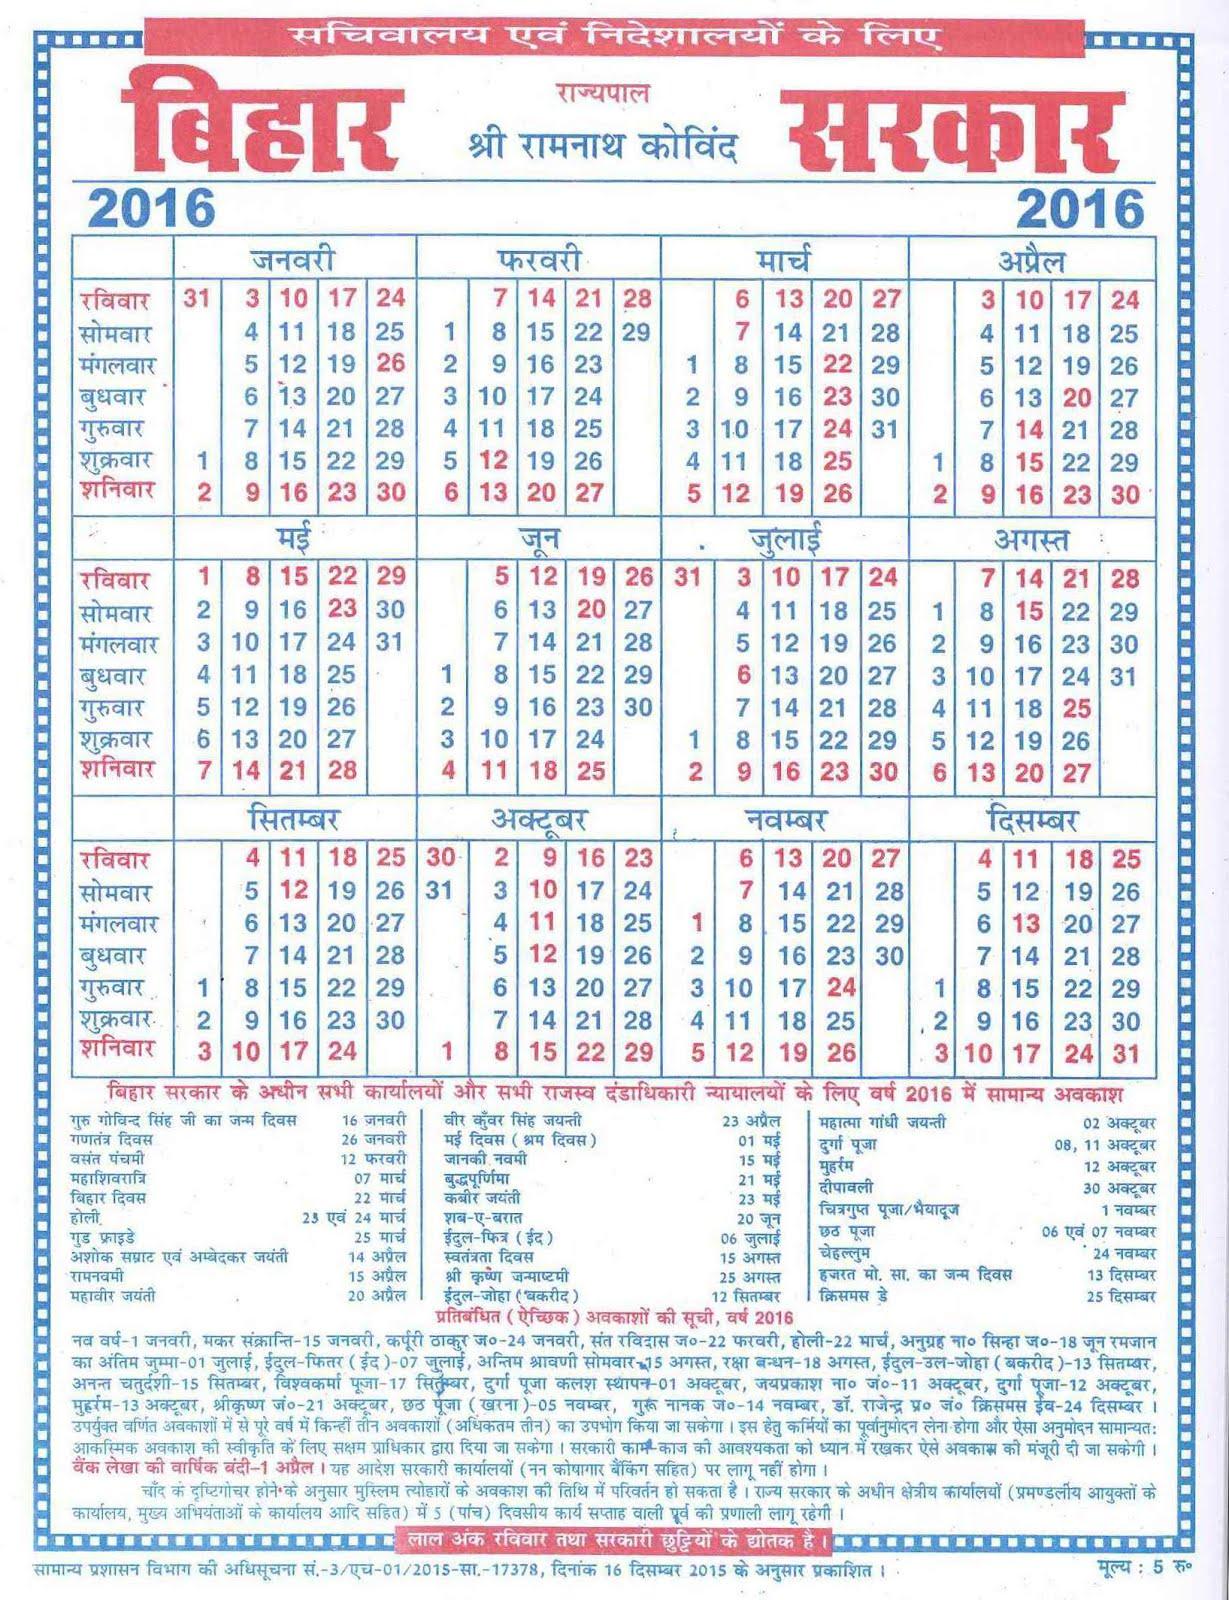 Bihar Govt Calendar 2020 Pdf | Calendar For Planning intended for Bihar Government Calender